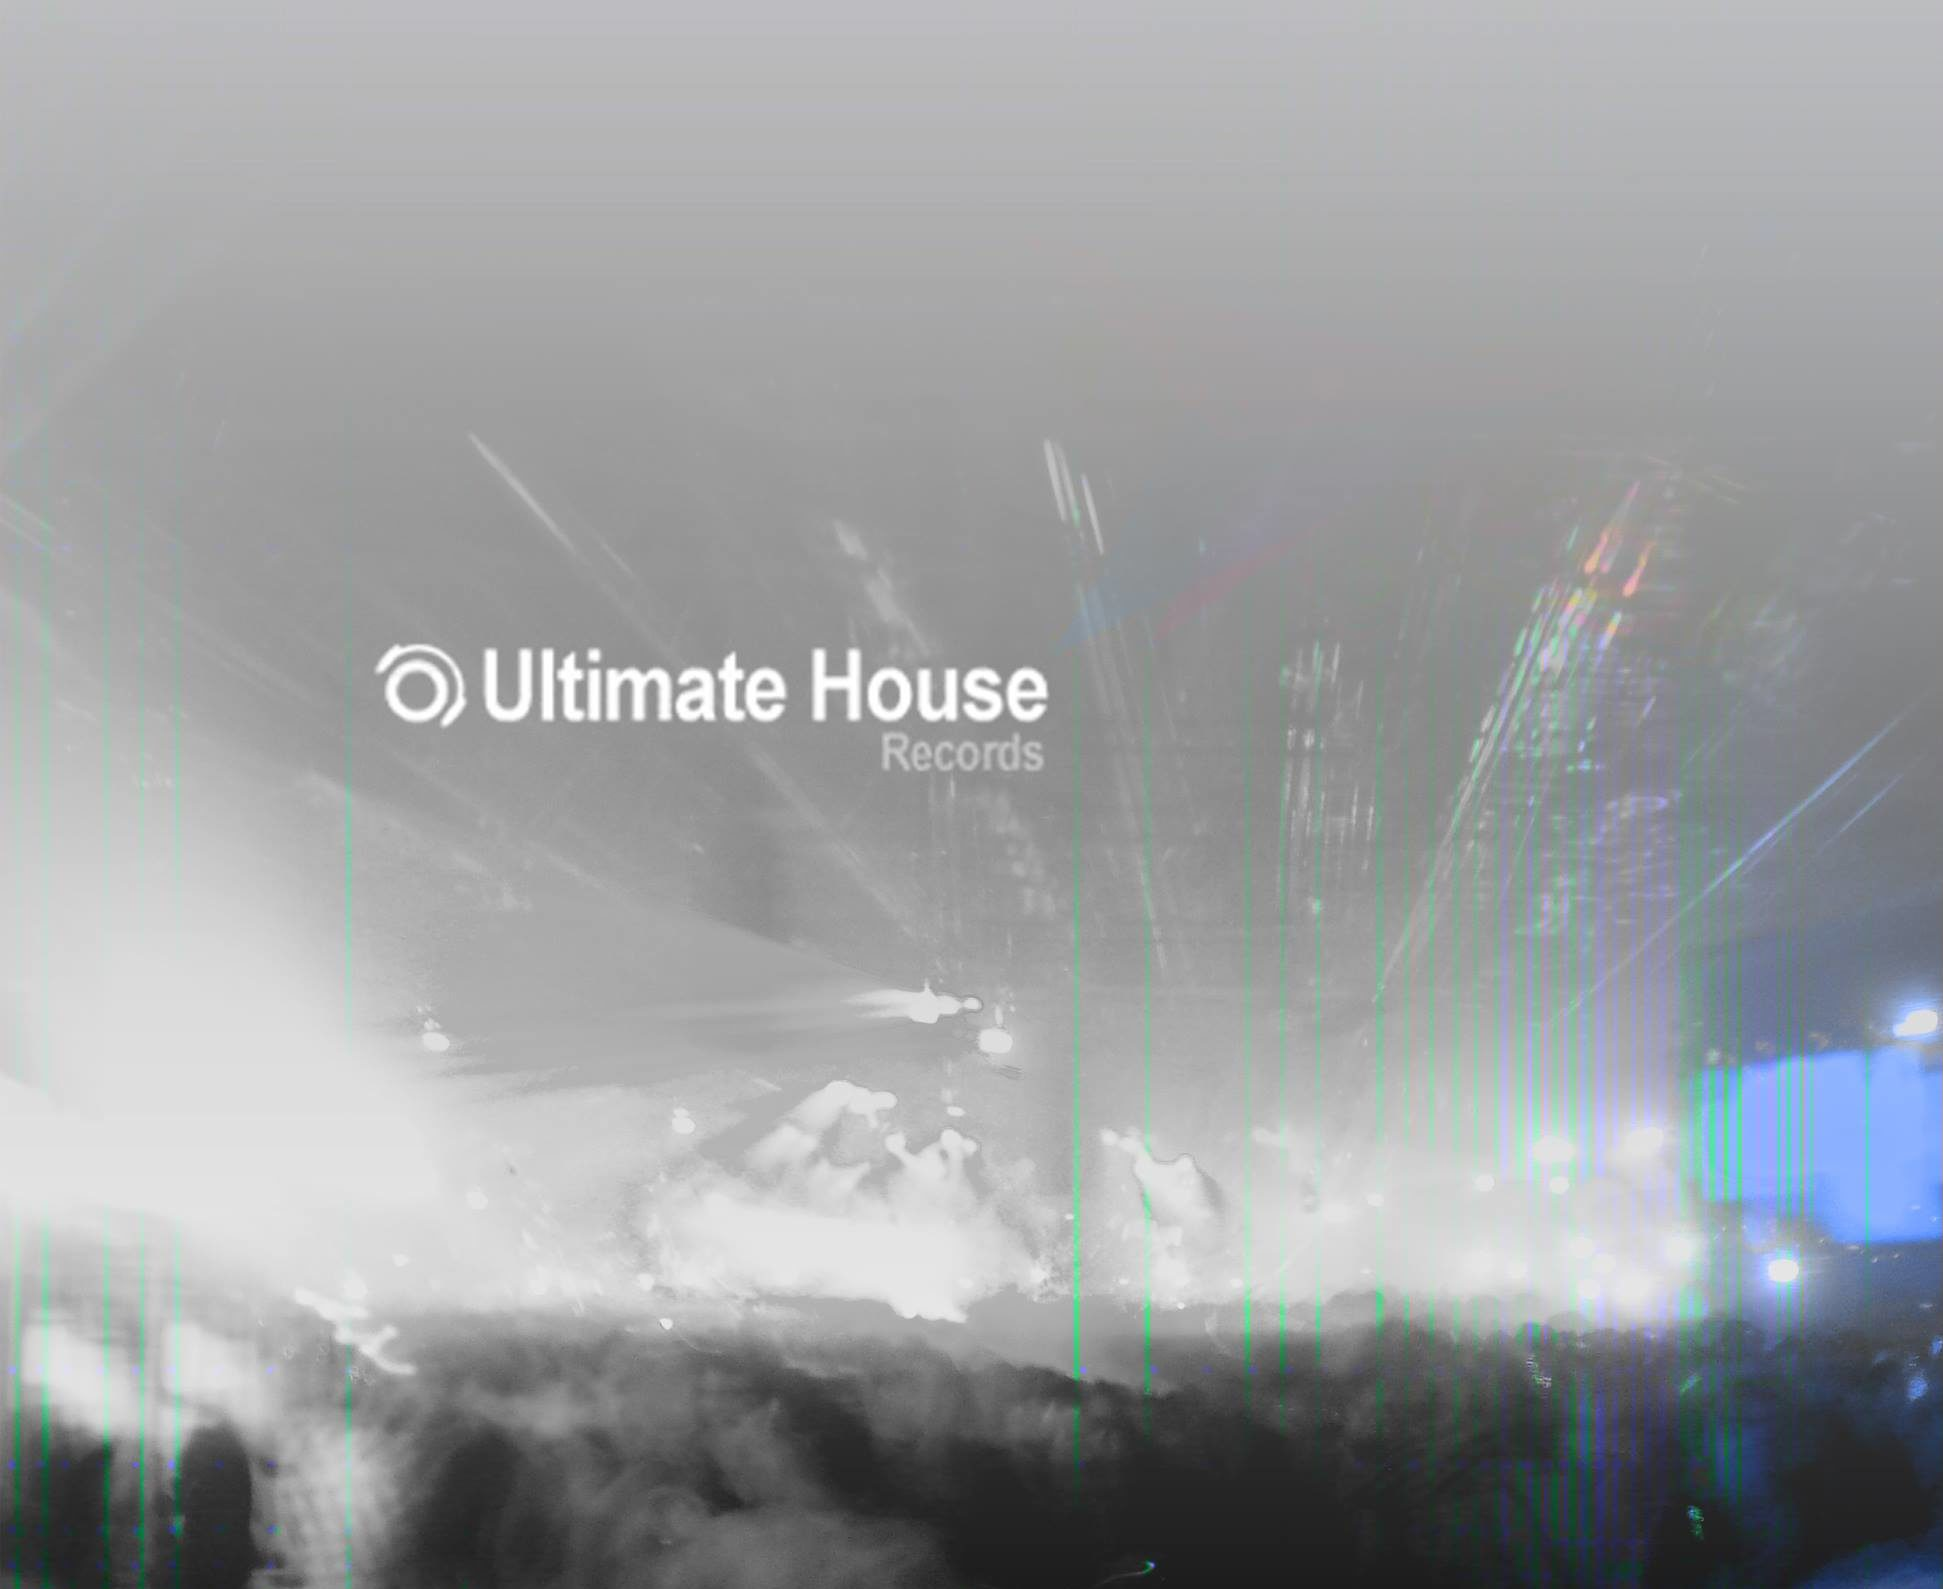 http://www.ultimate-house-records.com/wp-content/uploads/2019/03/27500603_1858154644196324_7186906034493702669_o-e1553174827880.jpg